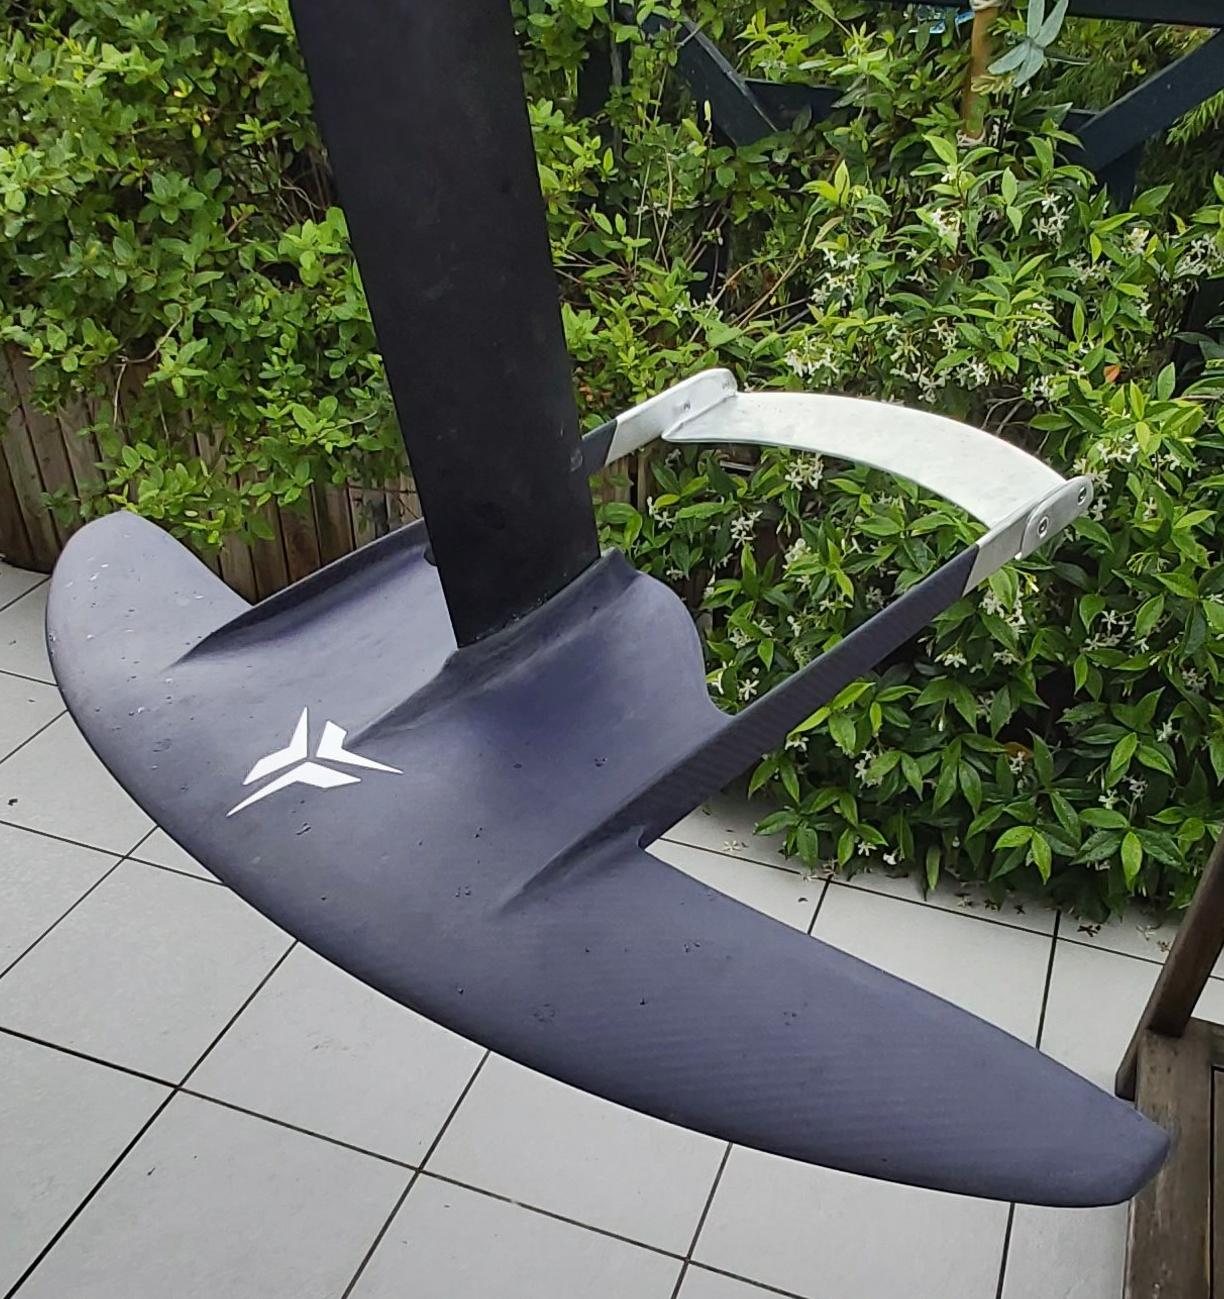 Angle stab sur fuselage court Wp-16240900241307622657896420850744-e1624090260657